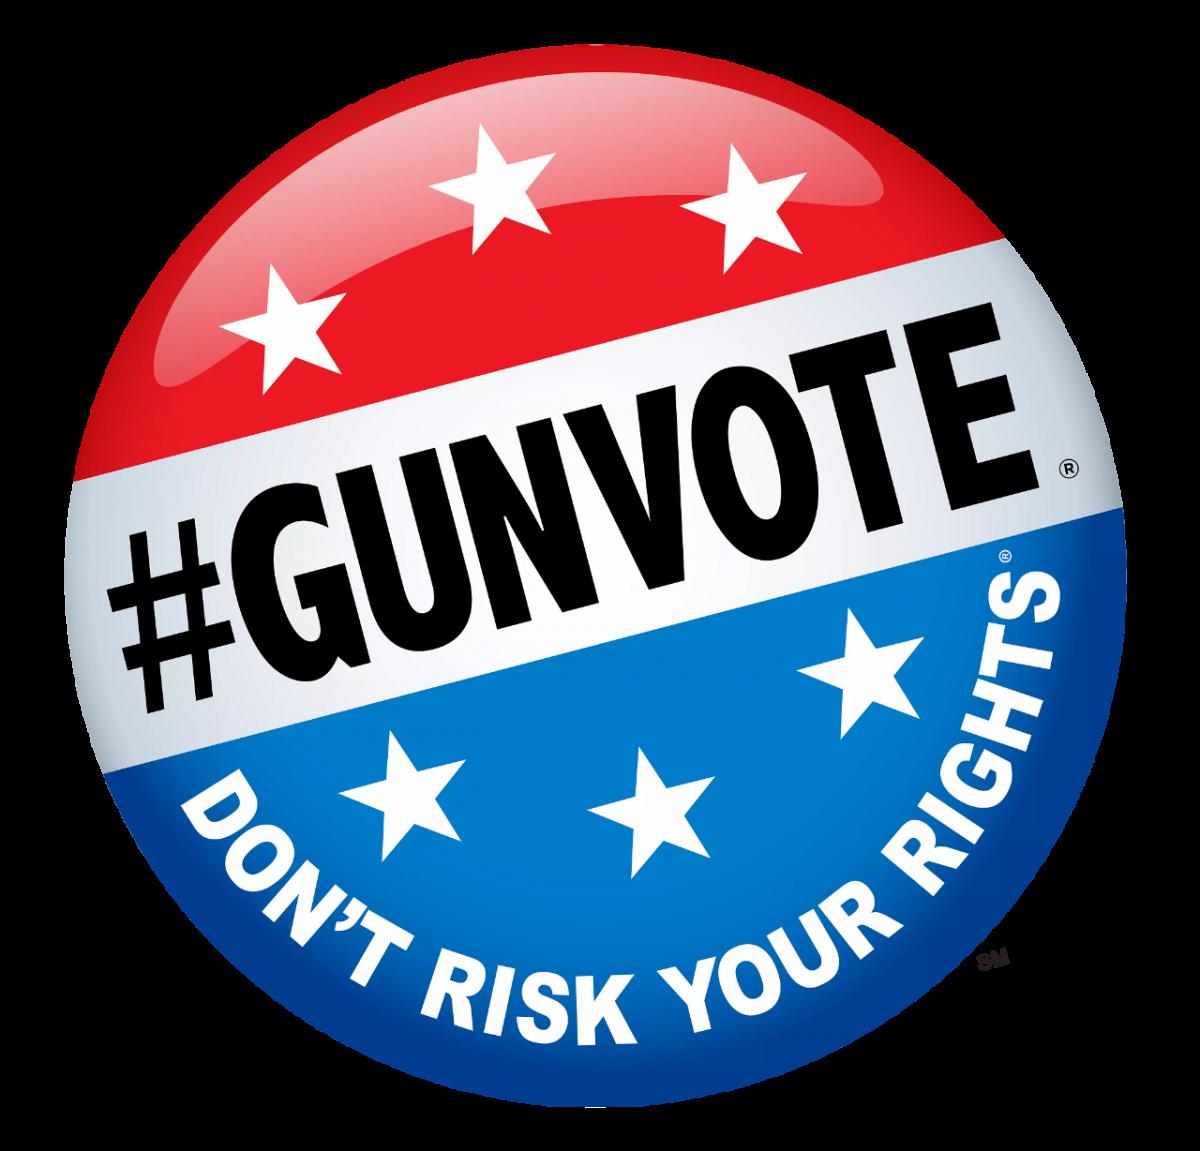 2020 Gun Vote – Defending The Second Amendment